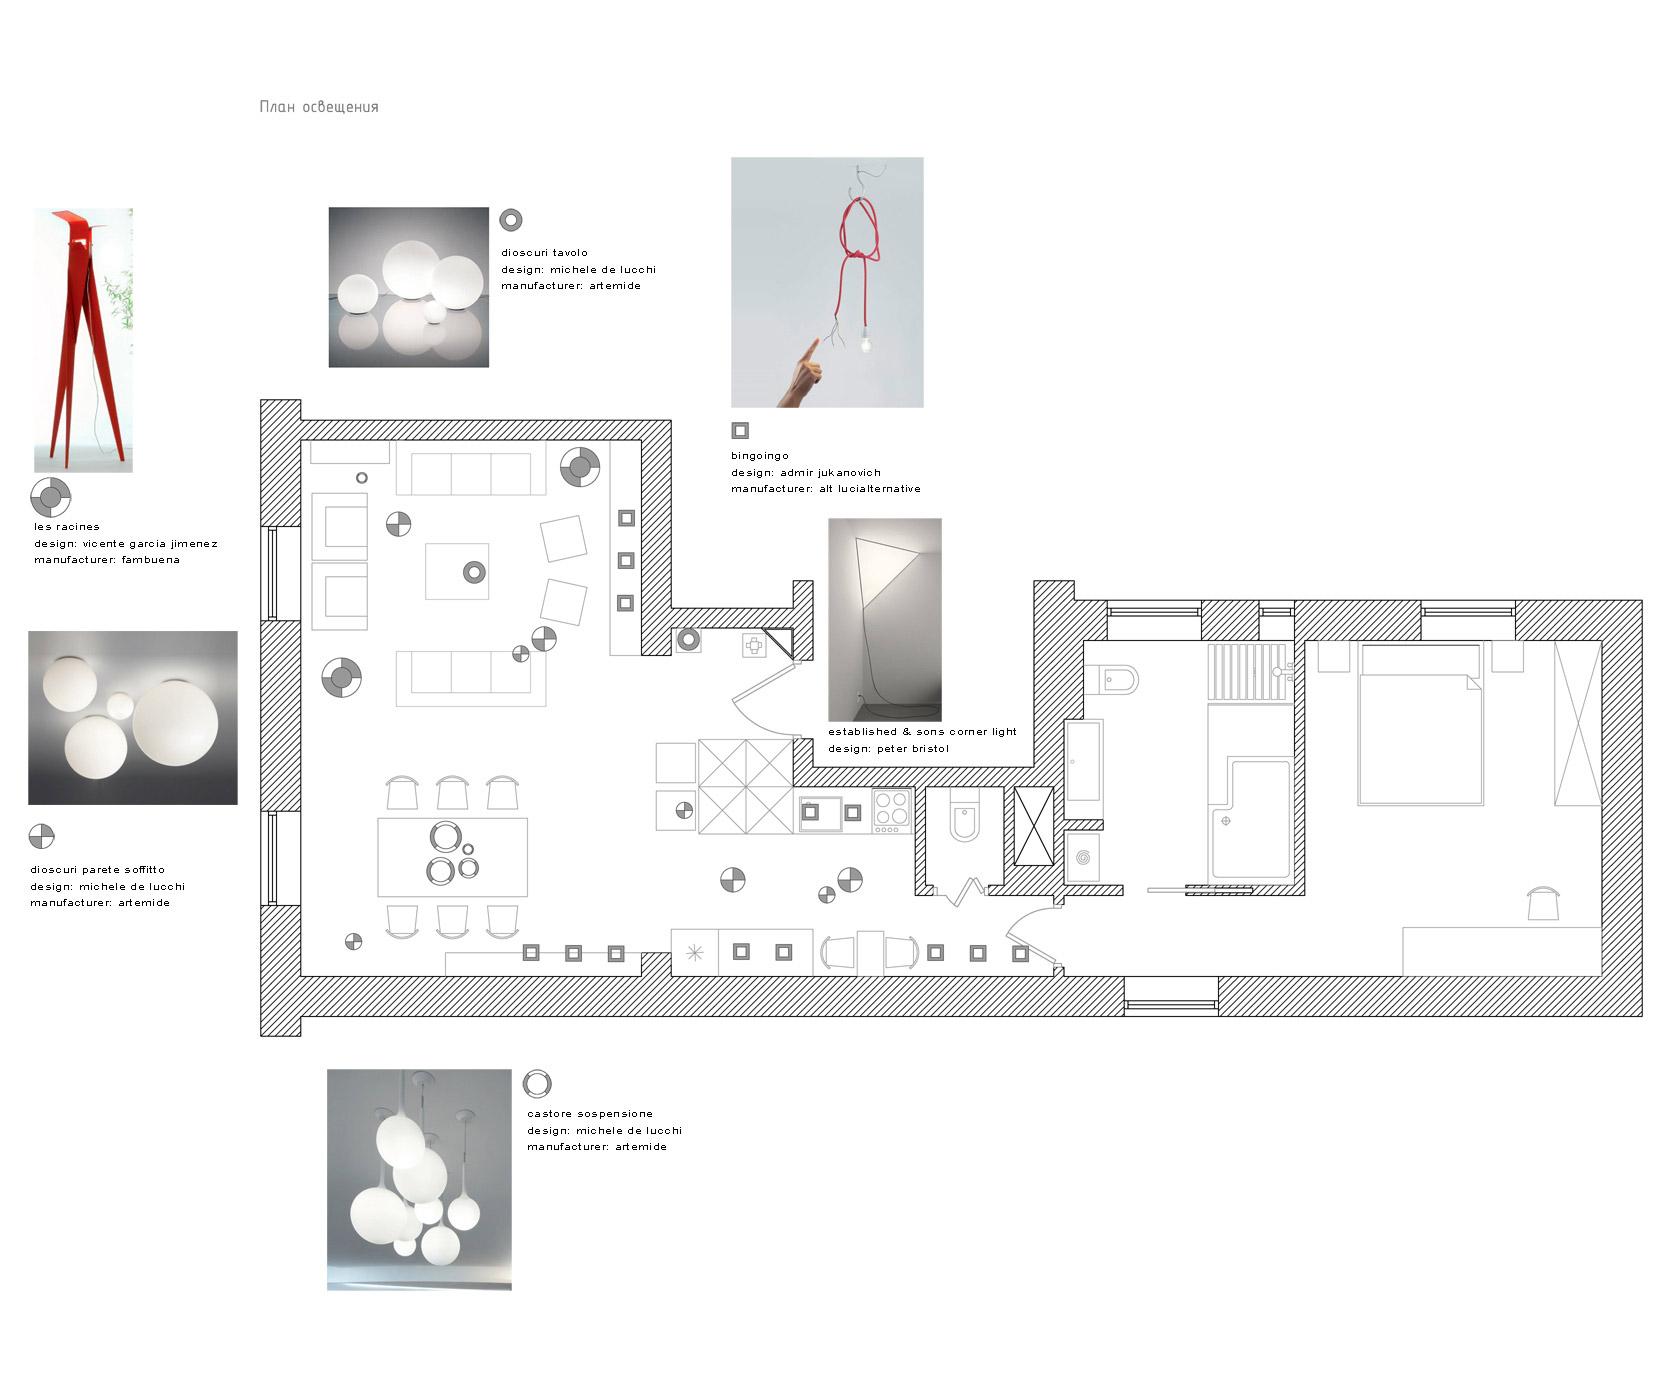 interior plan interior design ideas. Black Bedroom Furniture Sets. Home Design Ideas